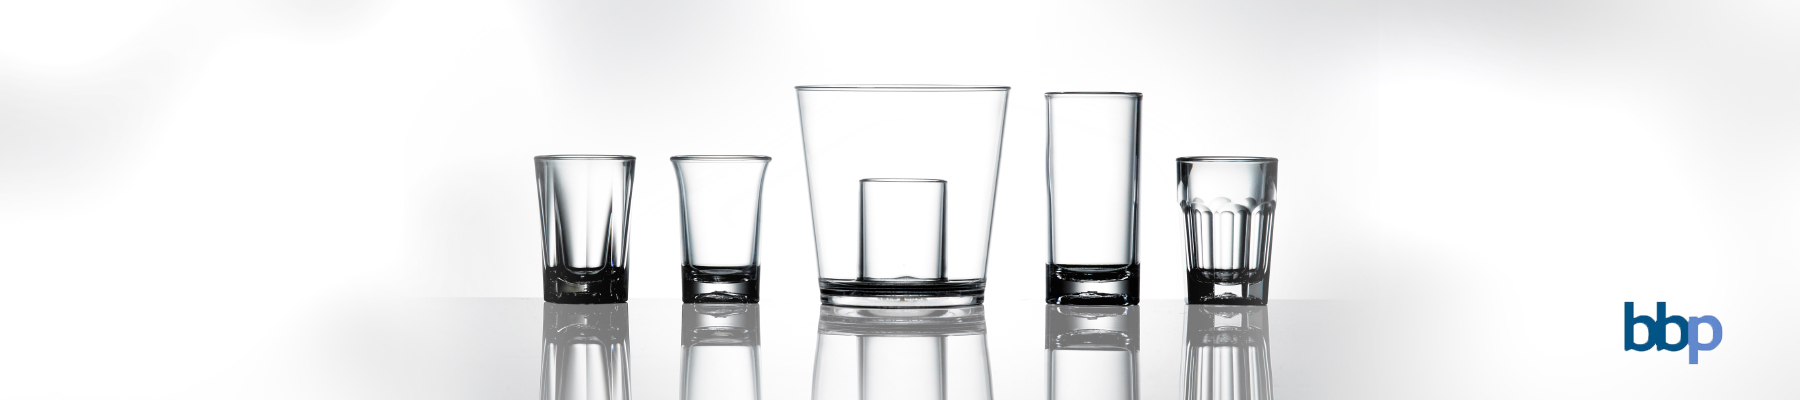 plastic_shot-glasses_uk